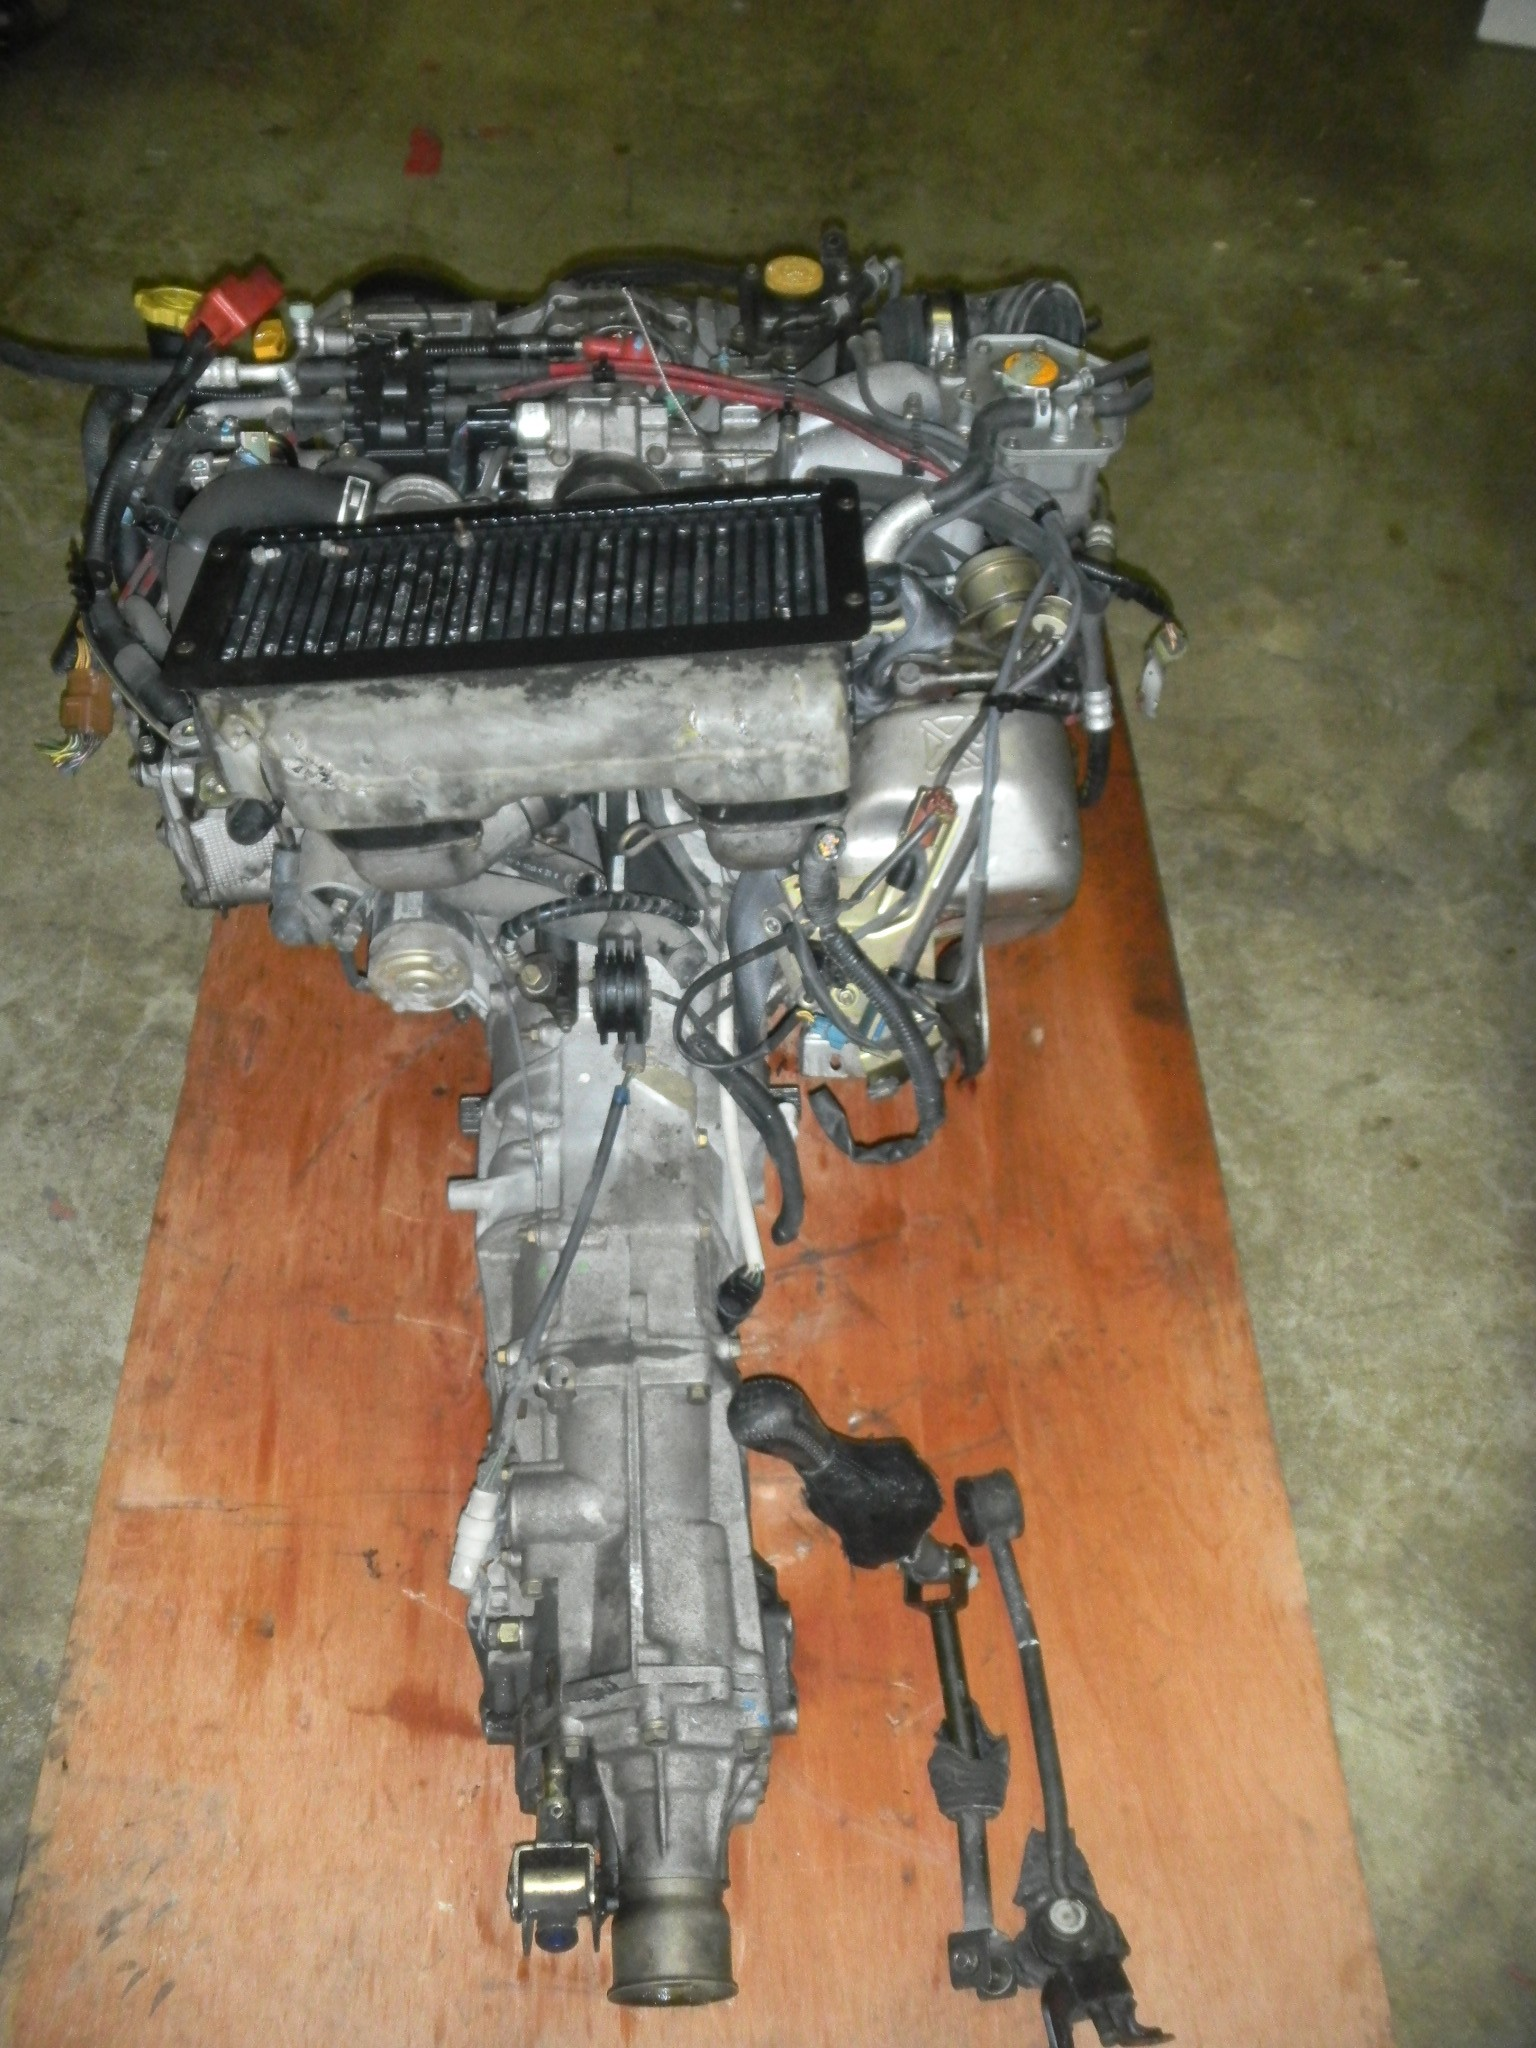 JDM SUBARU FORESTER (99-01) EJ20 TURBO ENGINE WITH 5 SPEED